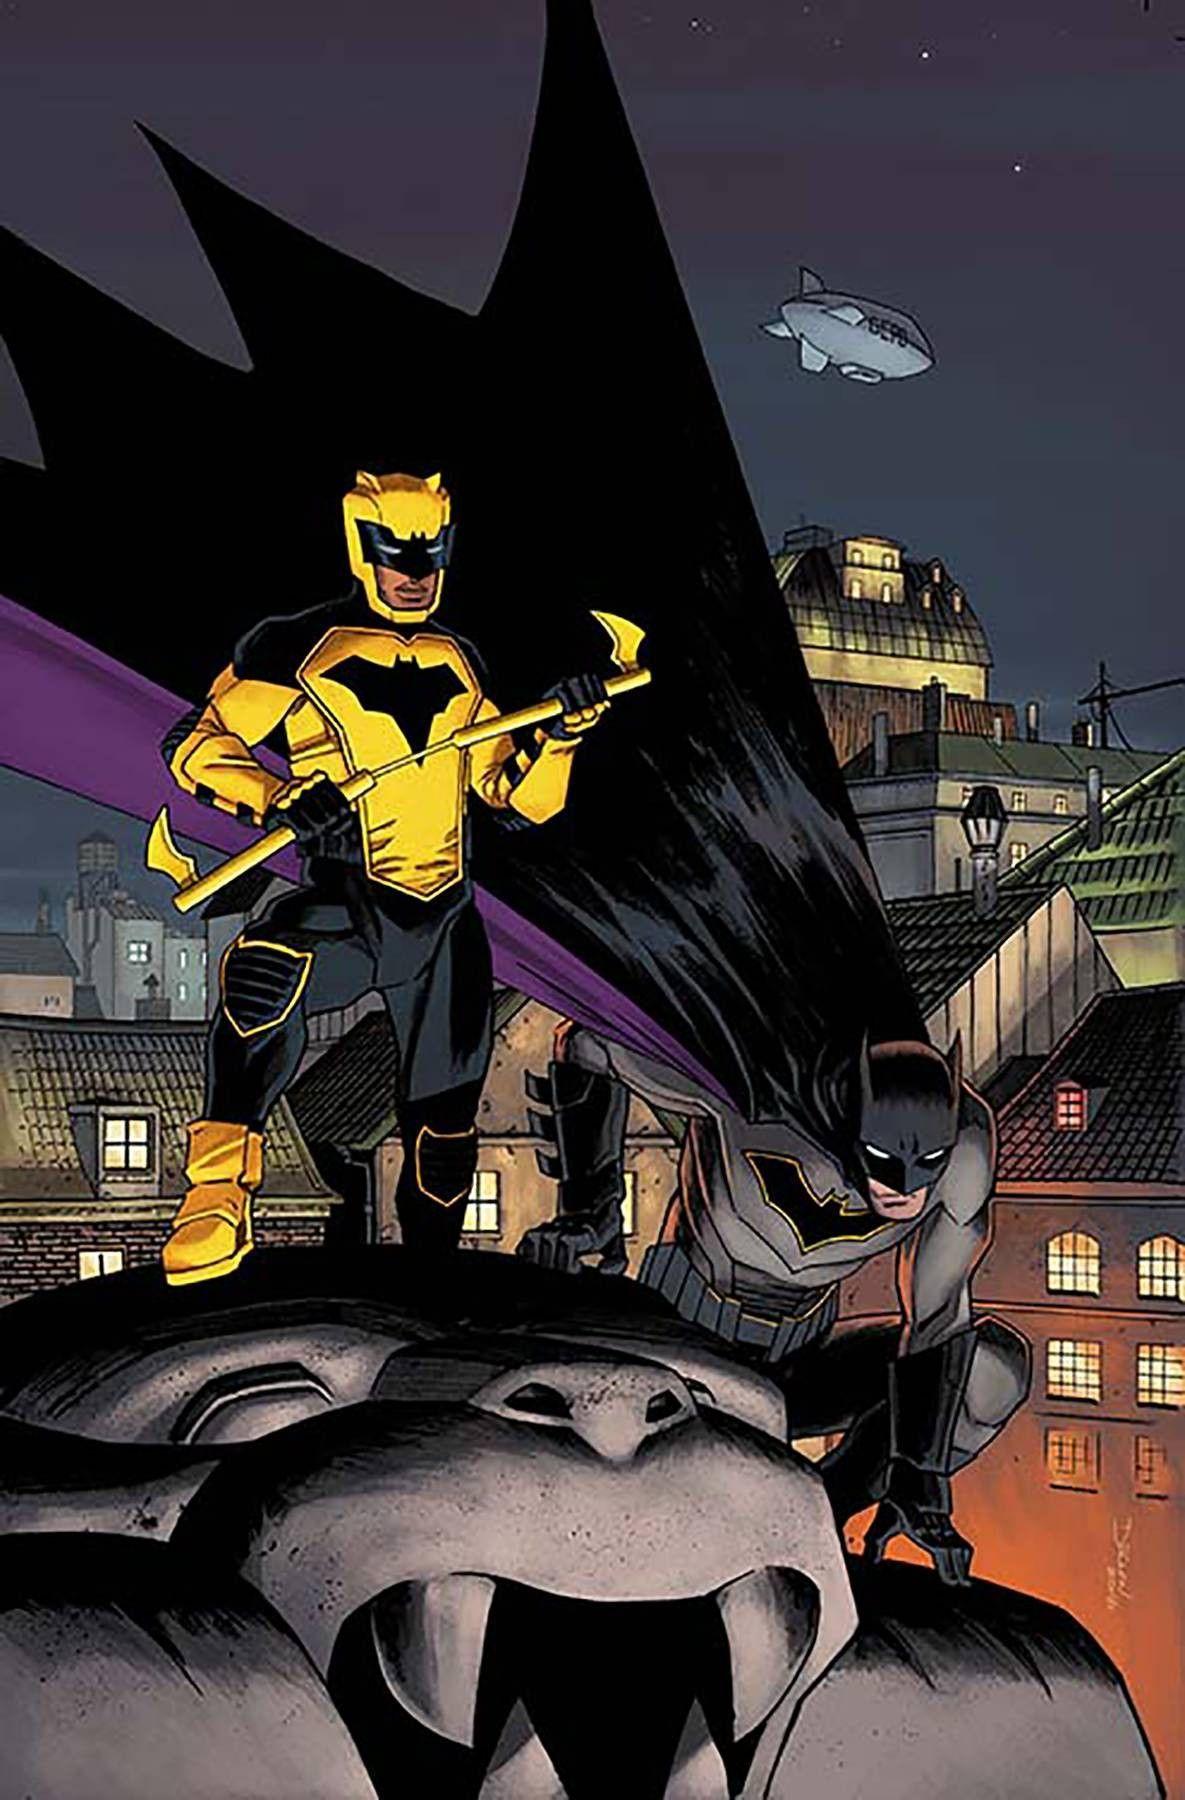 ALL STAR BATMAN #3 Declan Shalvey Variant | Only The Best